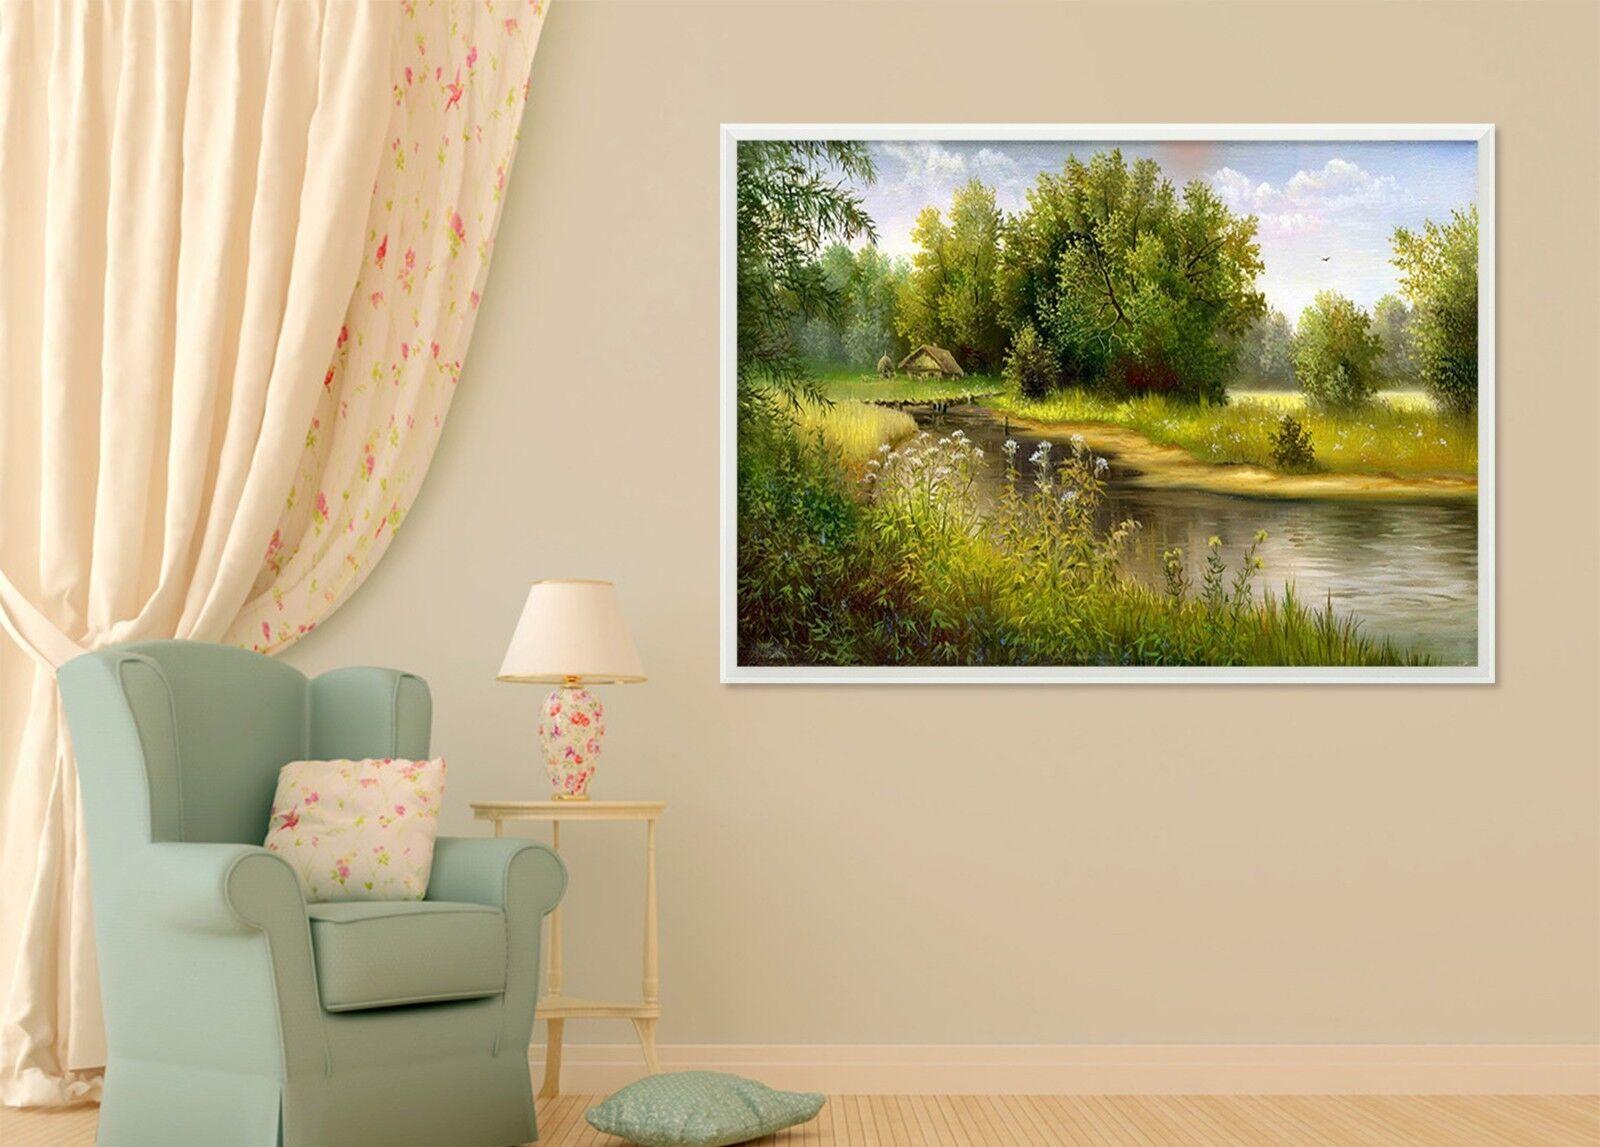 3D Clear River 4 Framed Poster Home Decor Print Painting Art AJ WALLPAPER